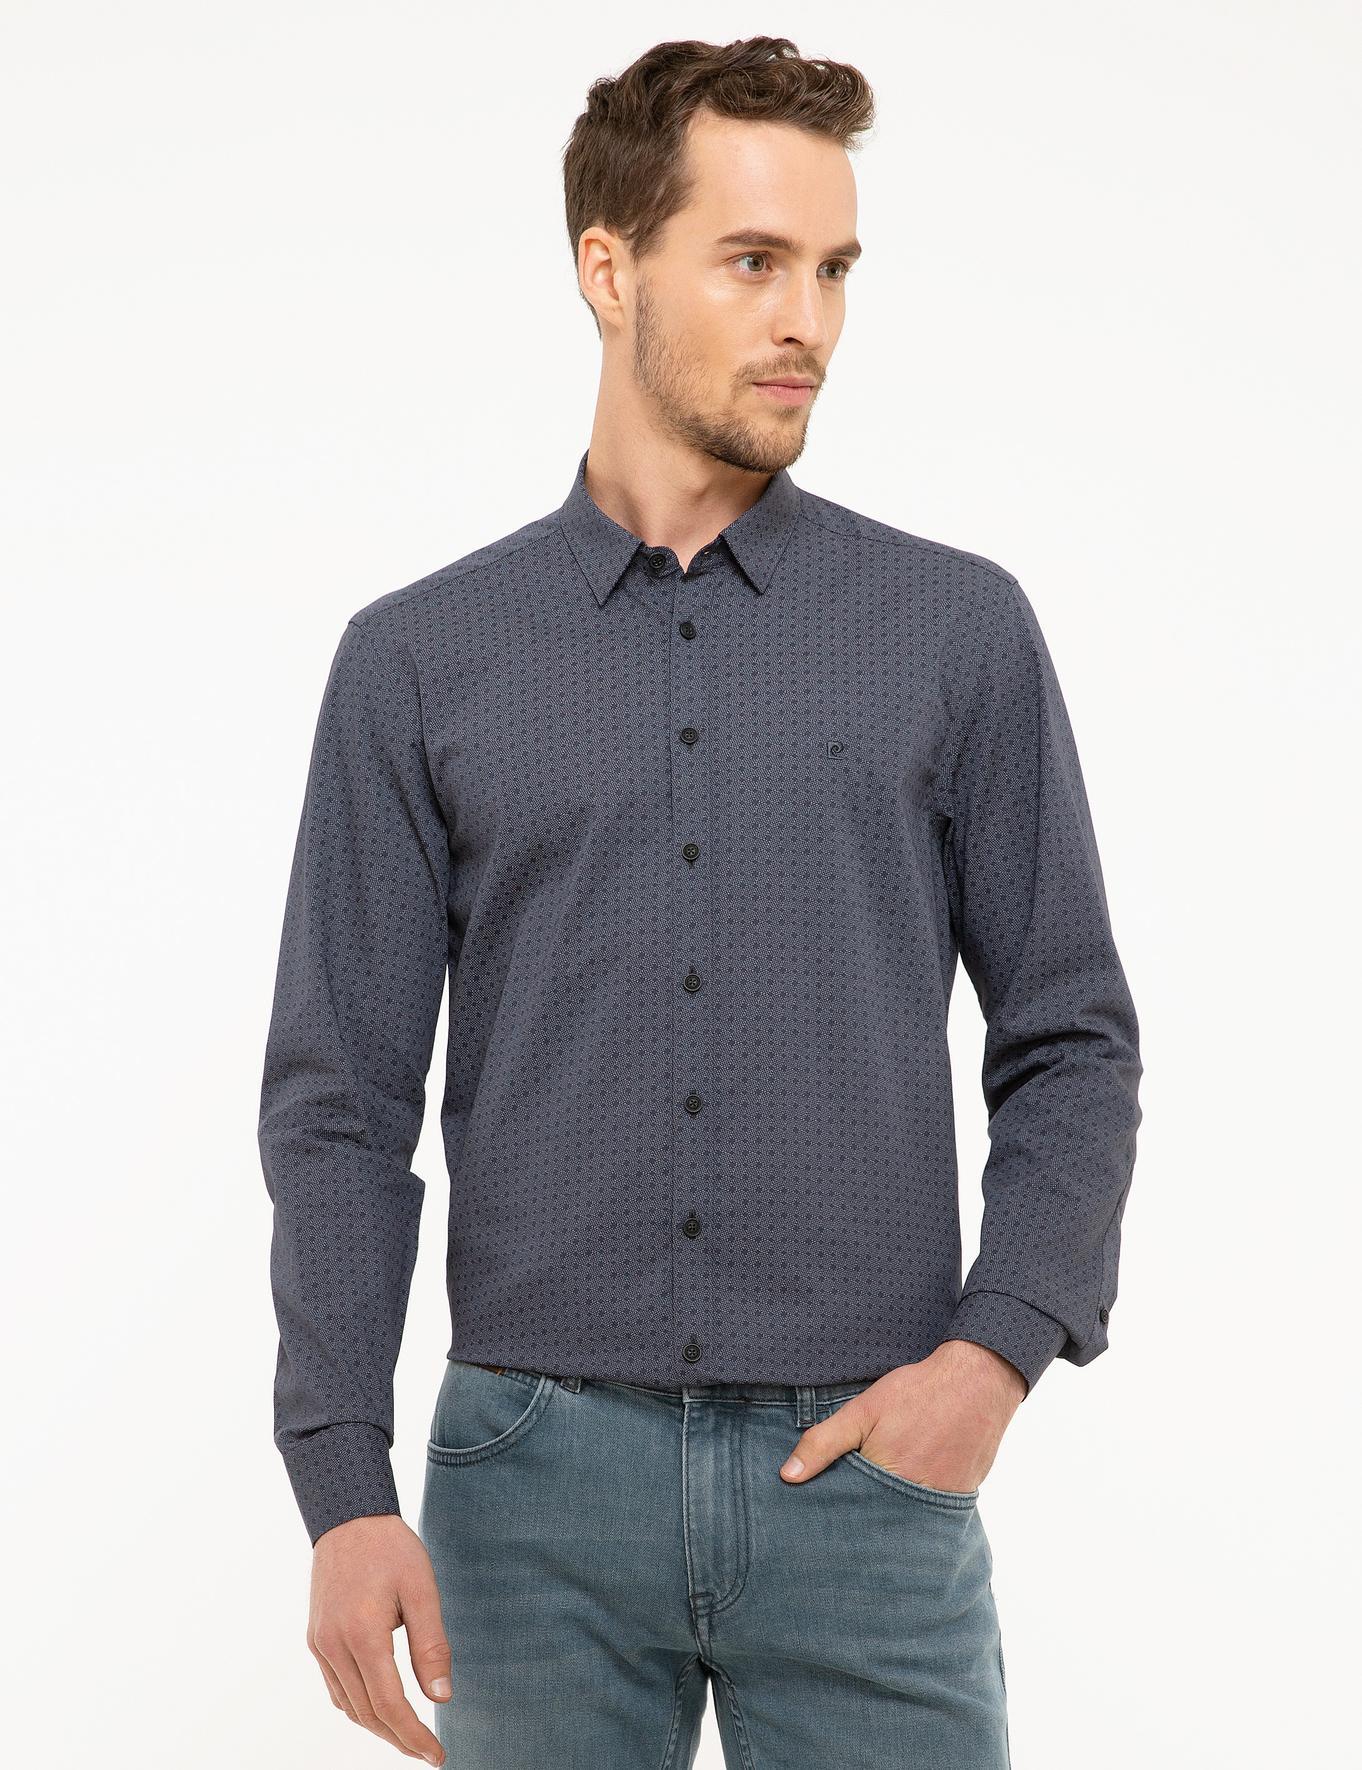 Antrasit Gri Slim Fit Gömlek